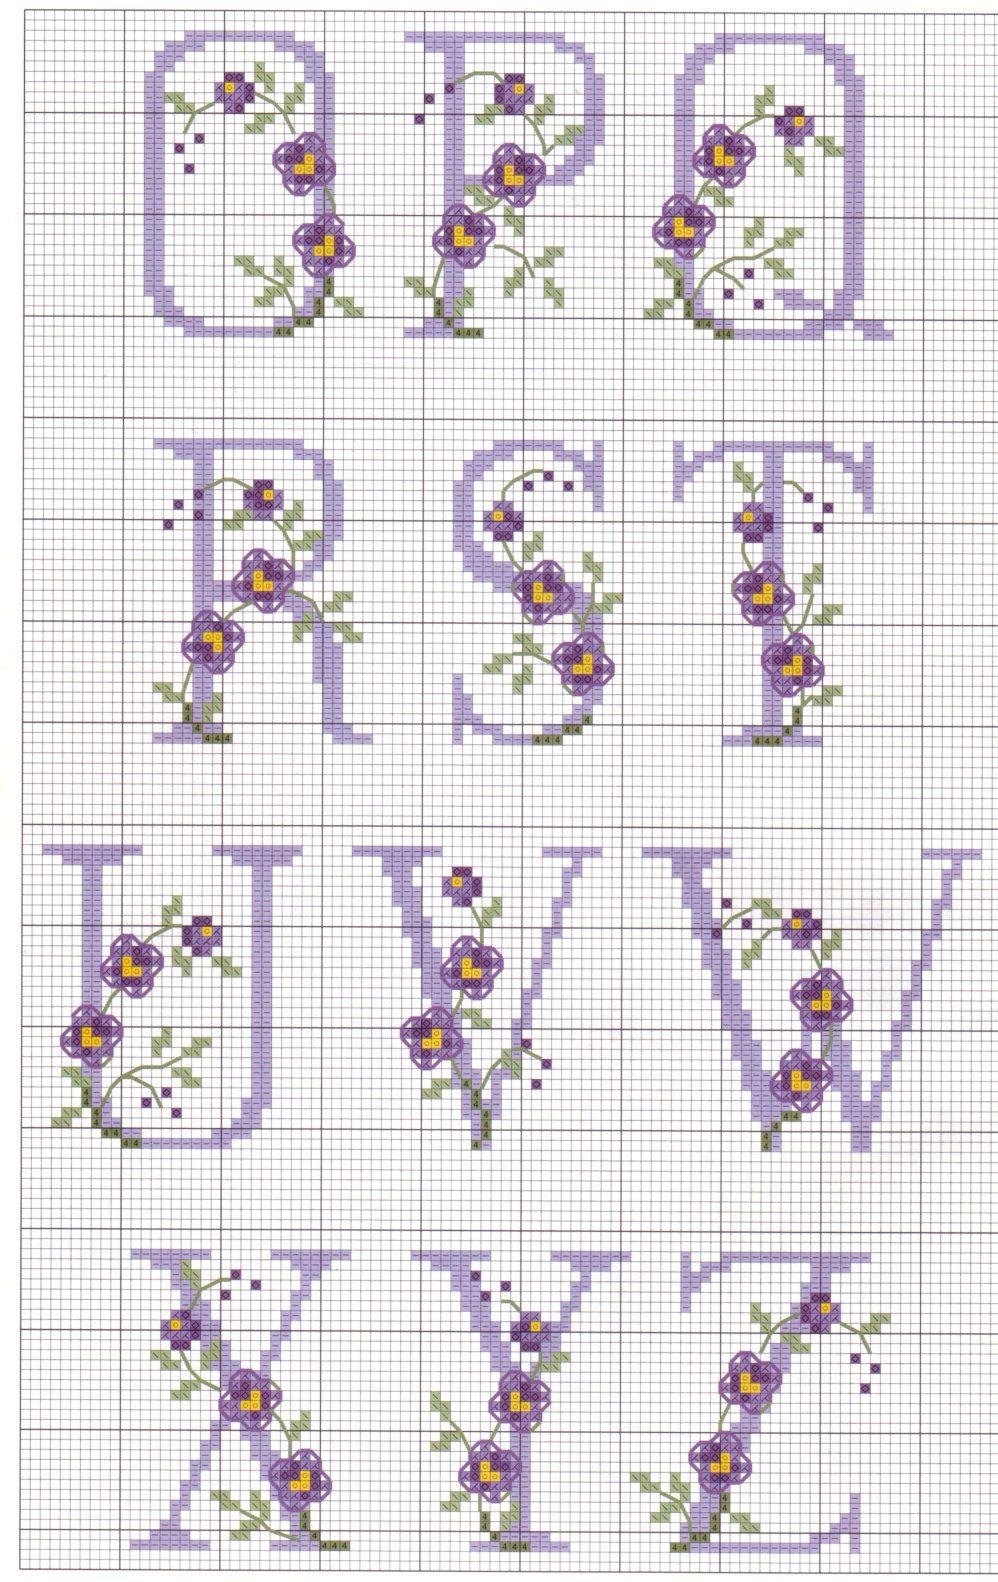 Punto croce schemi gratis e tutorial schemi punto croce for Punto croce schemi alfabeto